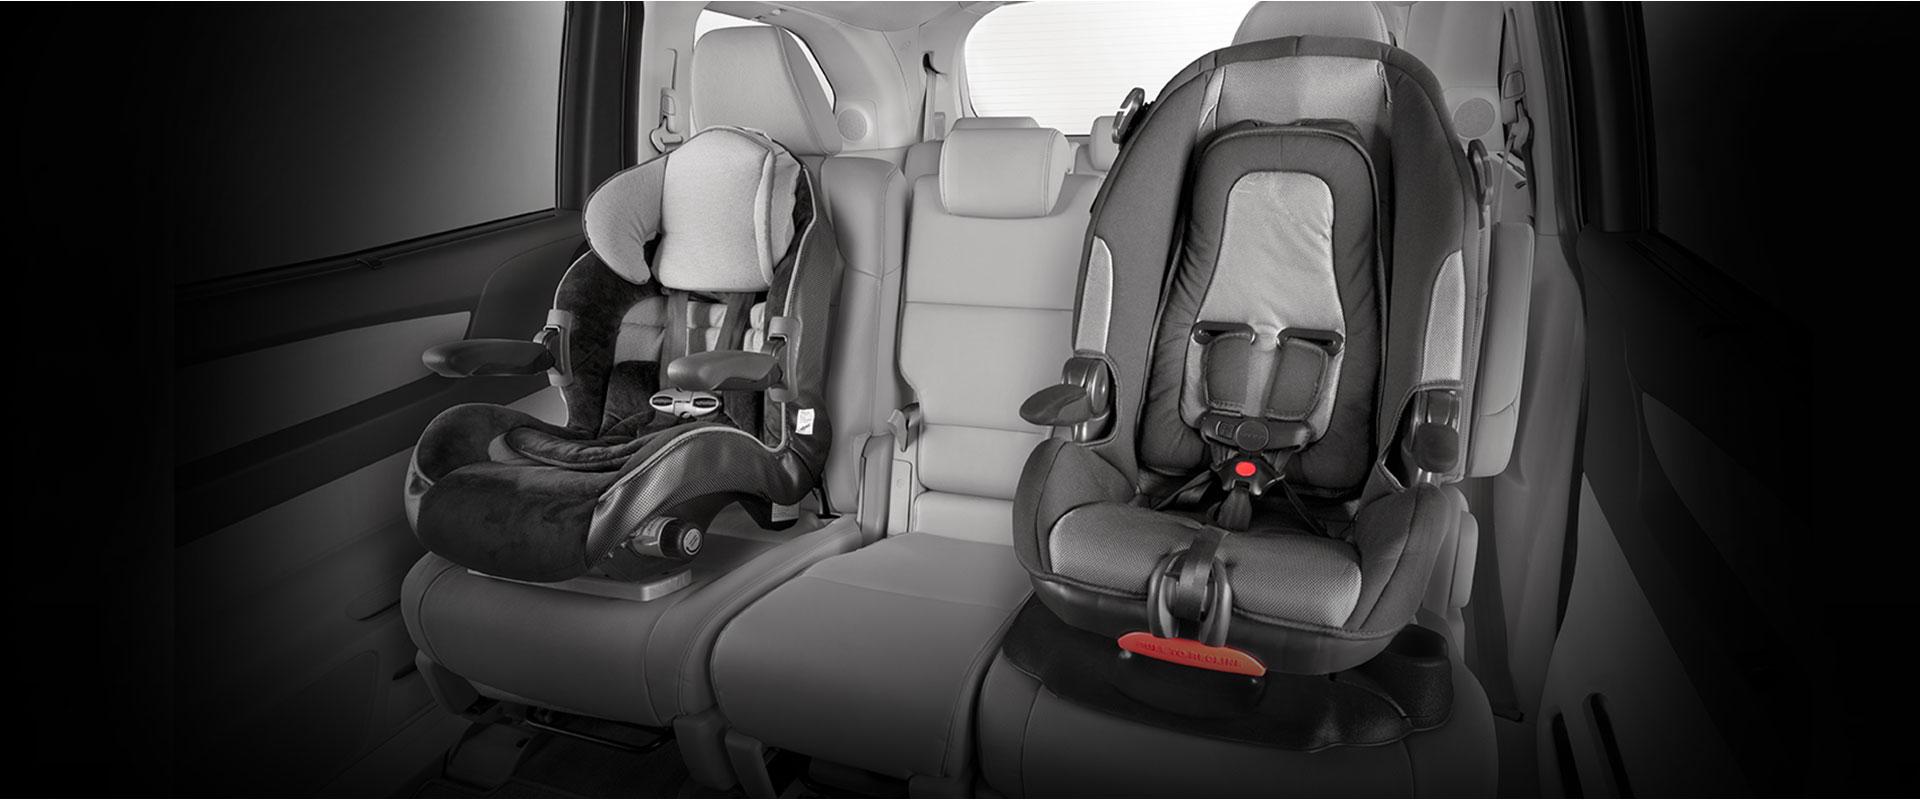 2017 Honda Odyssey Feature Details Official Honda Site